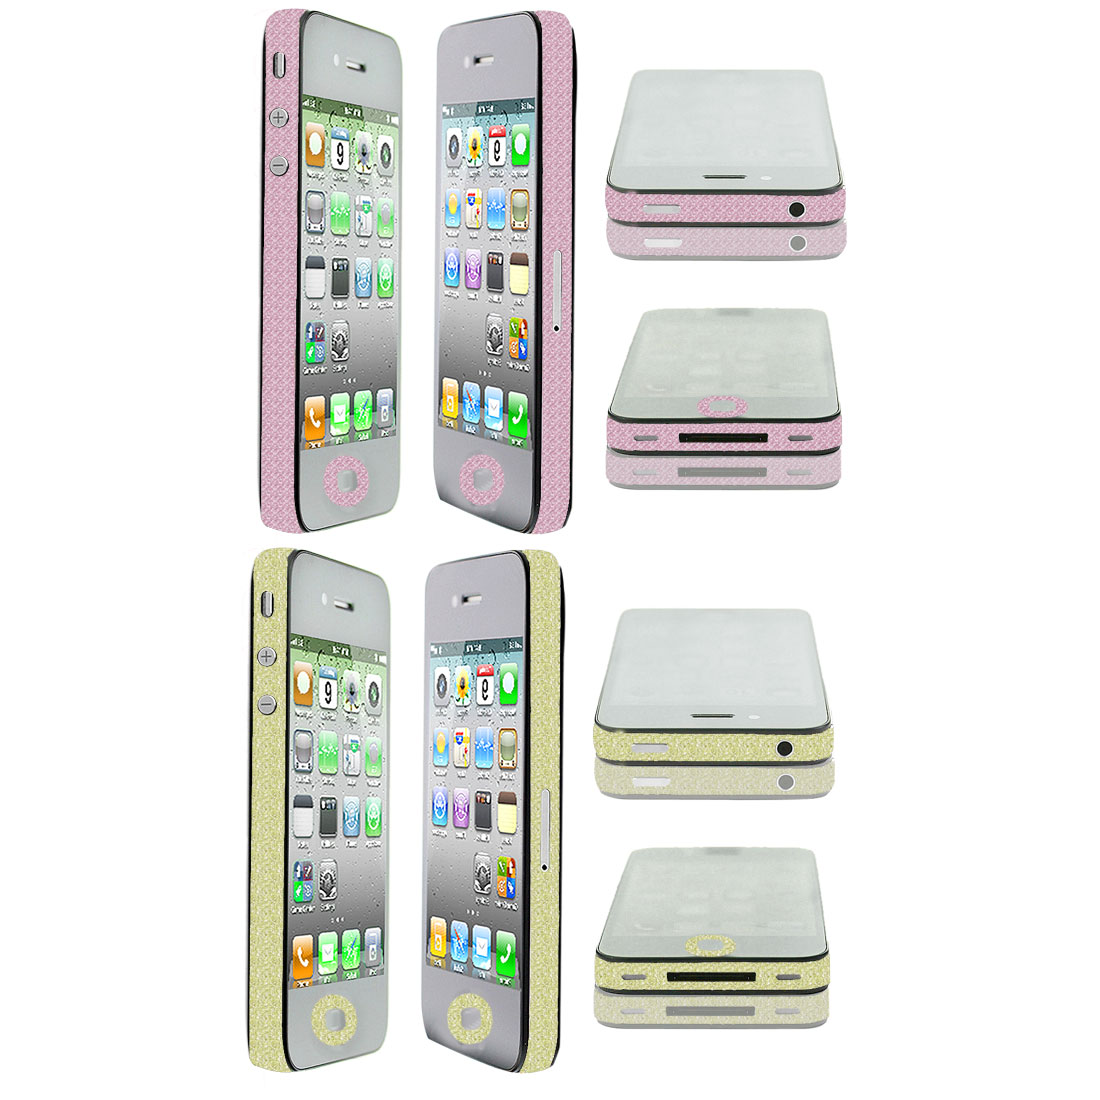 Unique Bargains Glitter Gold Tone Pink Edge Wrap Decal Sticker 2 Pcs for iPhone 4 4G 4S 4GS